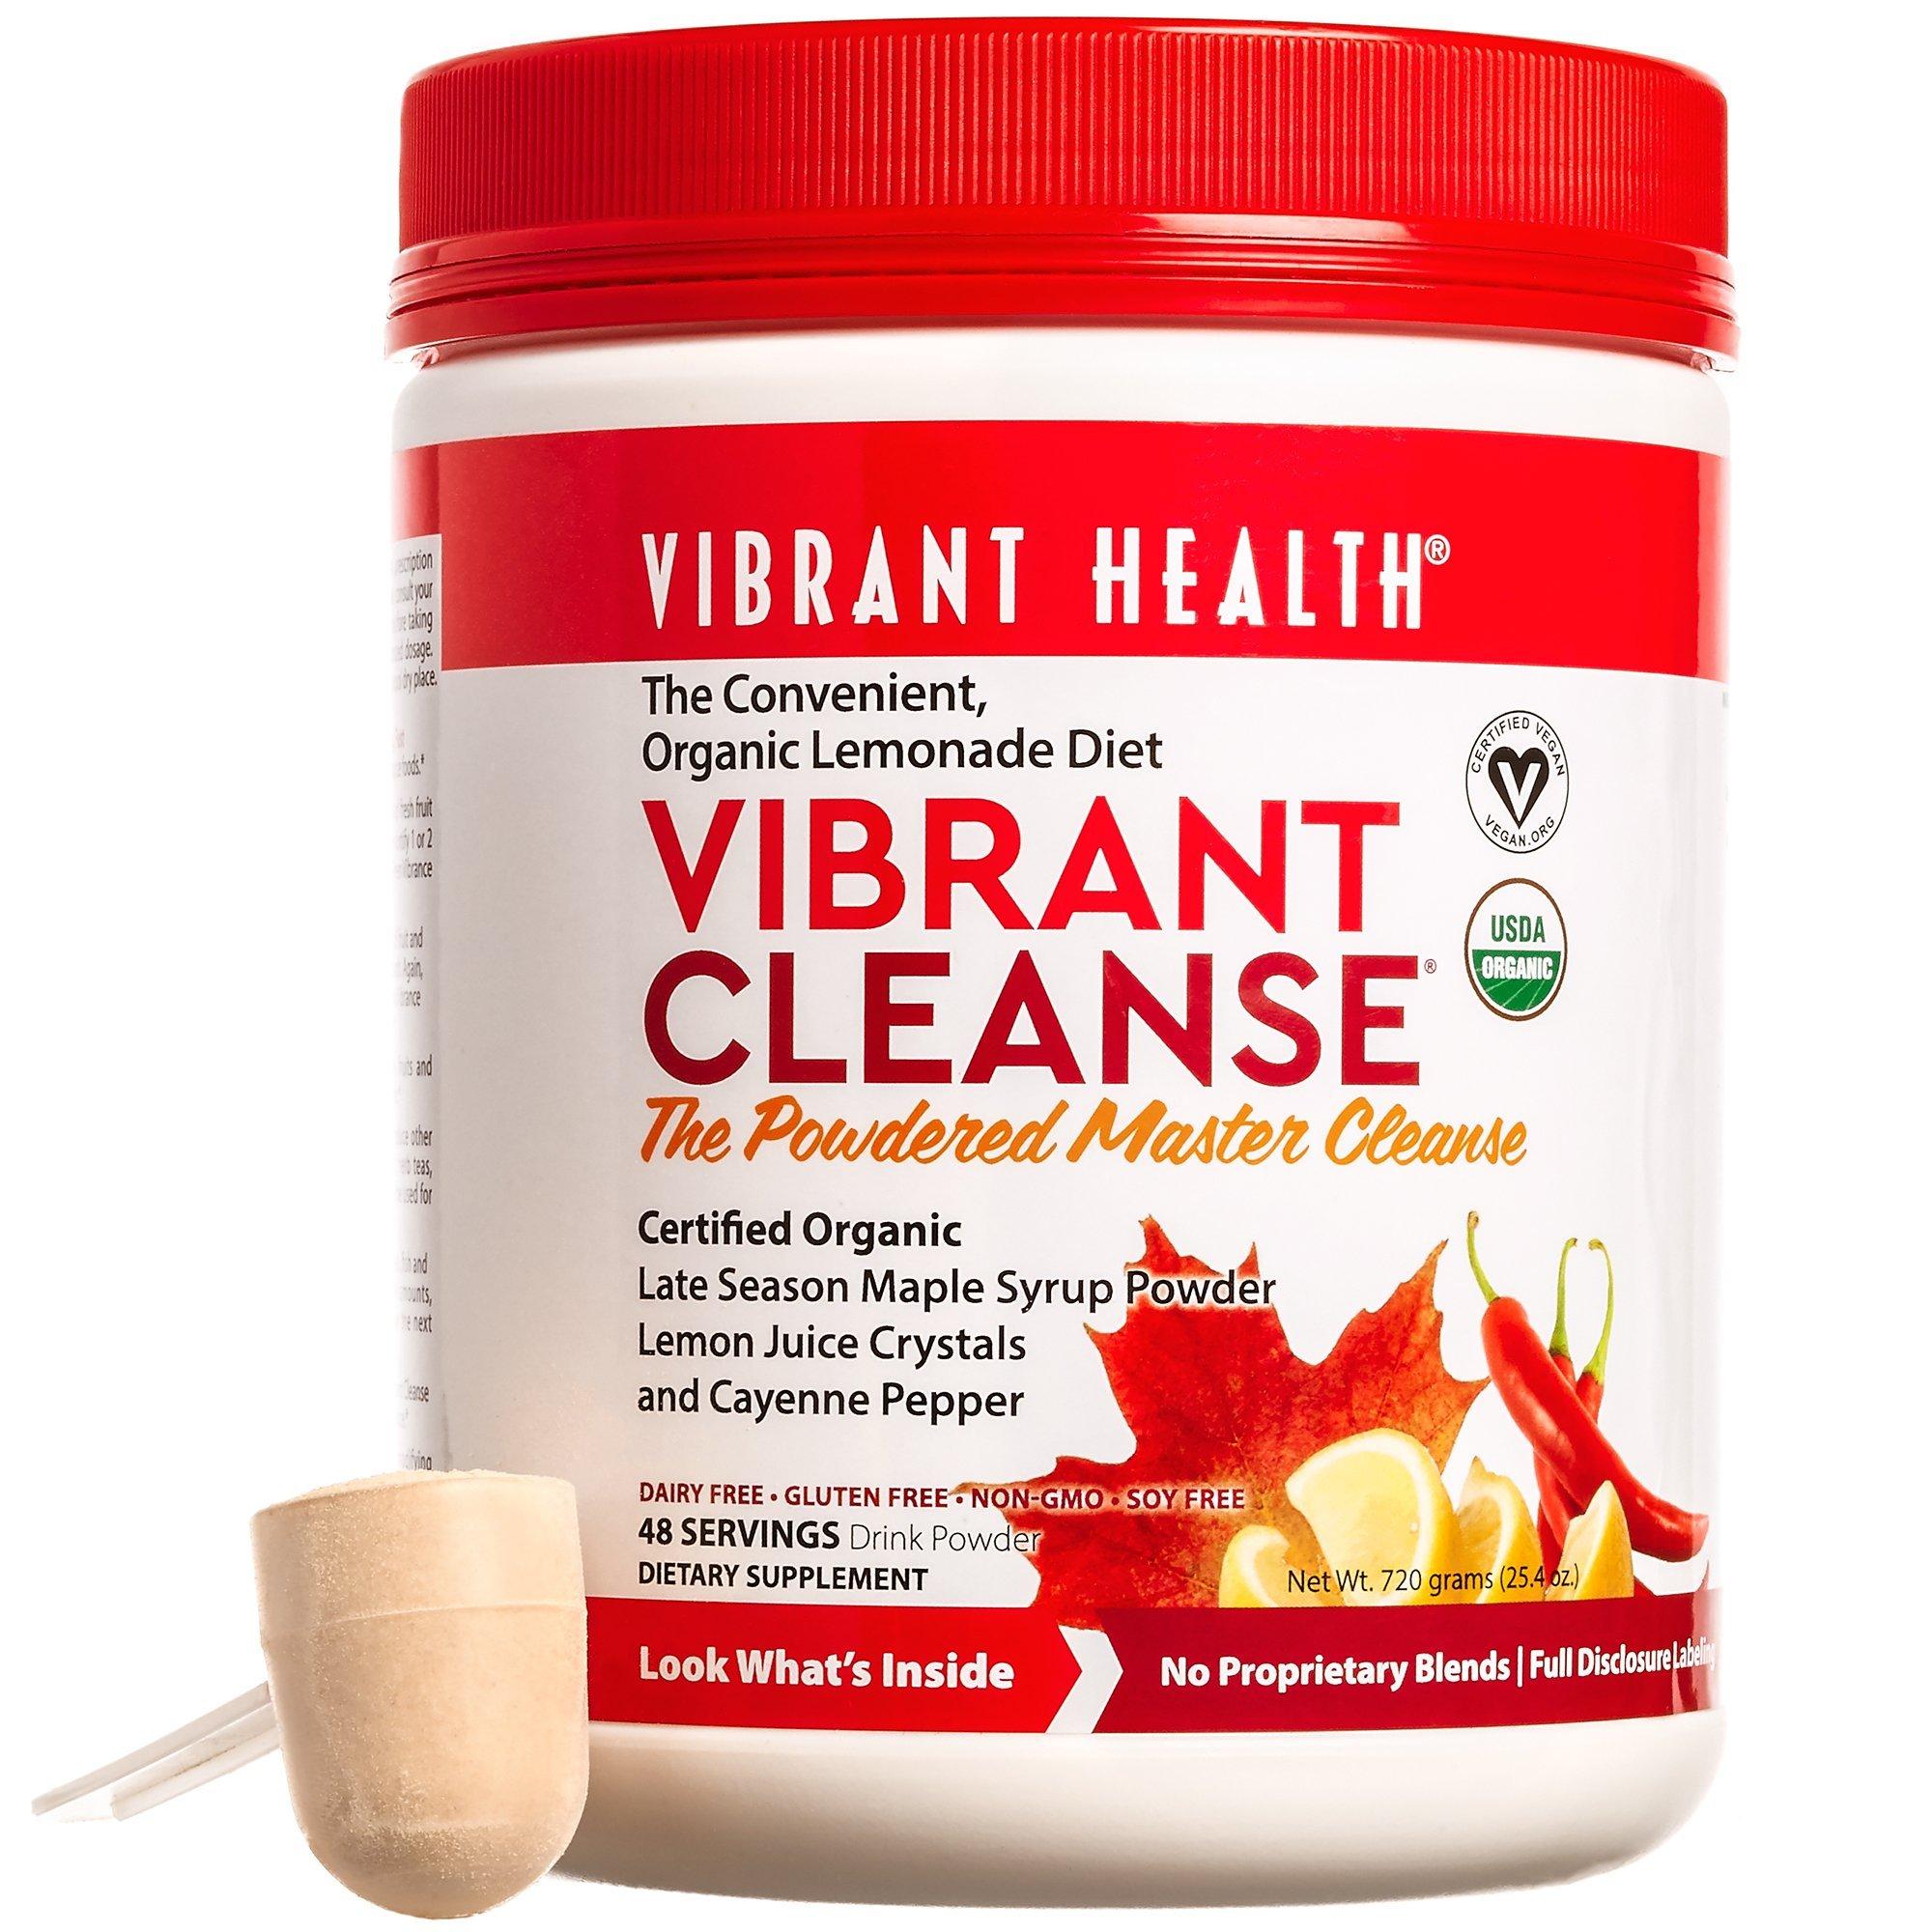 Vibrant Health - Vibrant Cleanse, The Convenient Organic Lemonade Diet, 48 Servings by Vibrant Health